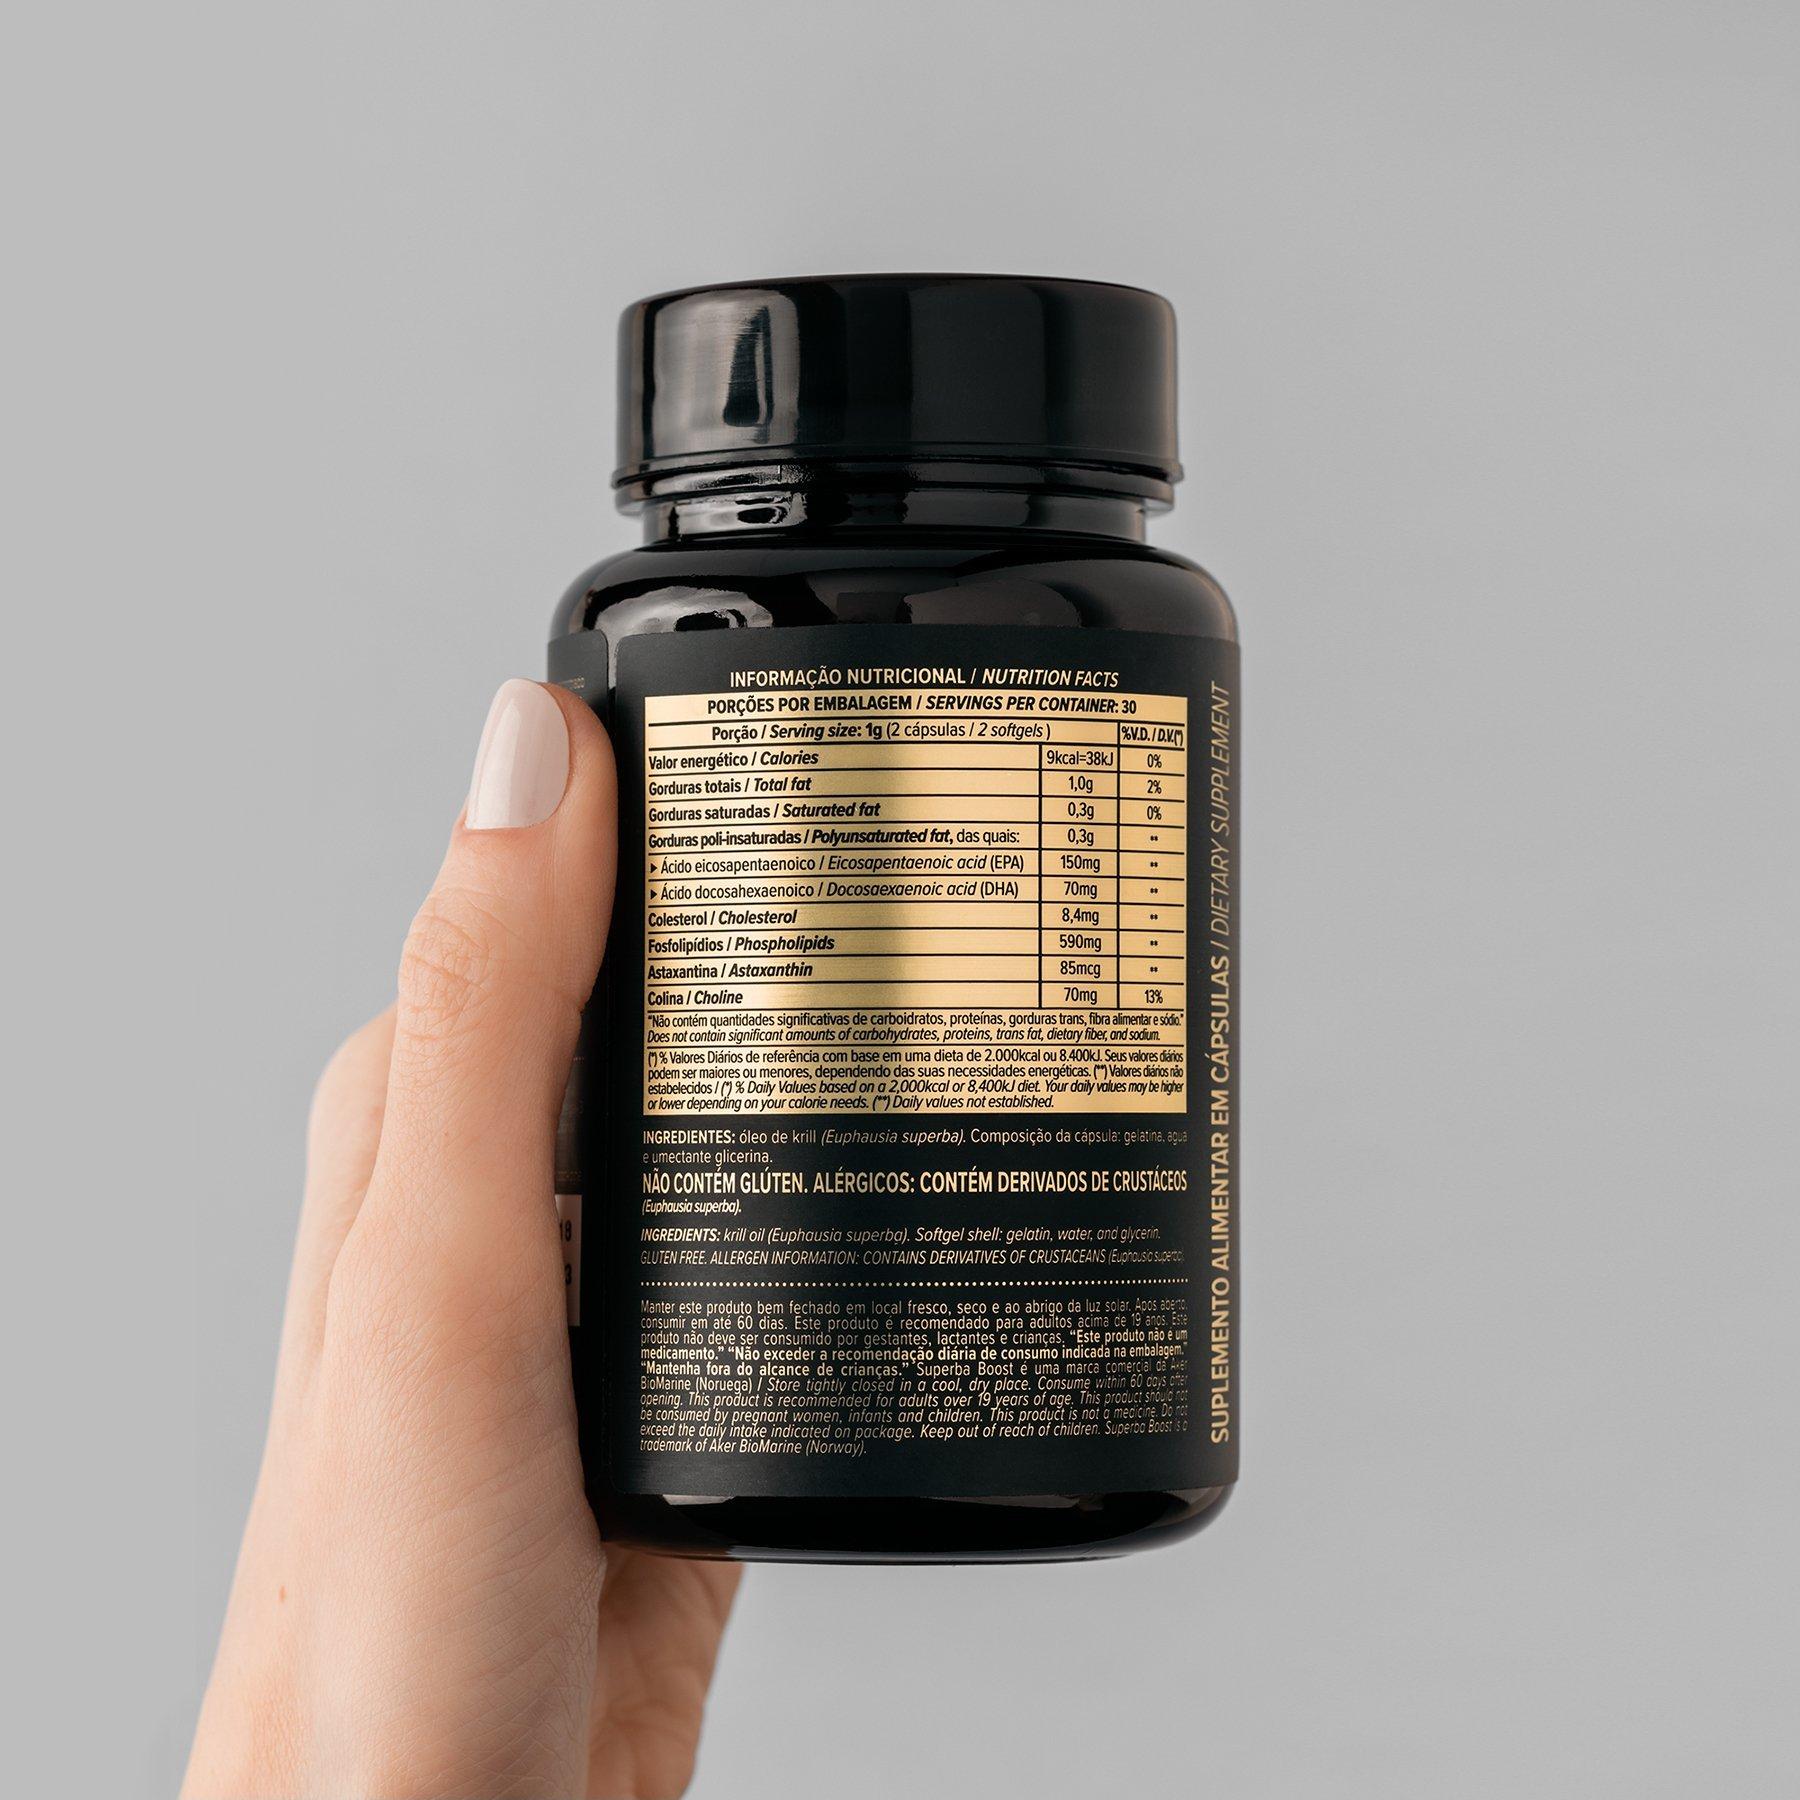 KRILL OIL 60 CÁPSULAS - ESSENTIAL NUTRITION